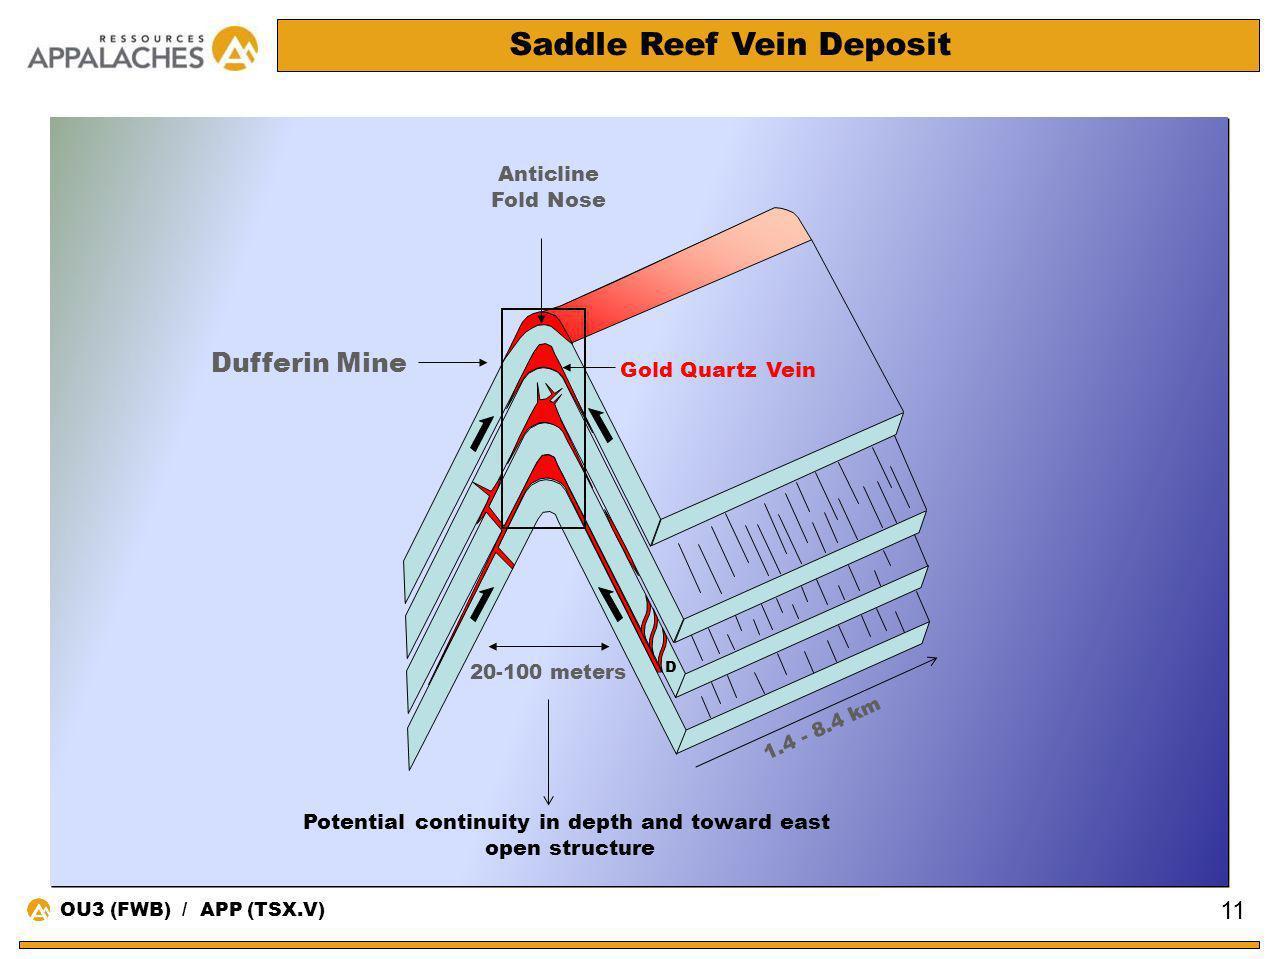 Saddle Reef Vein Deposit Anticline Fold Nose D Dufferin Mine Gold Quartz Vein 20-100 meters 1.4 - 8.4 km 11 OU3 (FWB) / APP (TSX.V) Potential continui